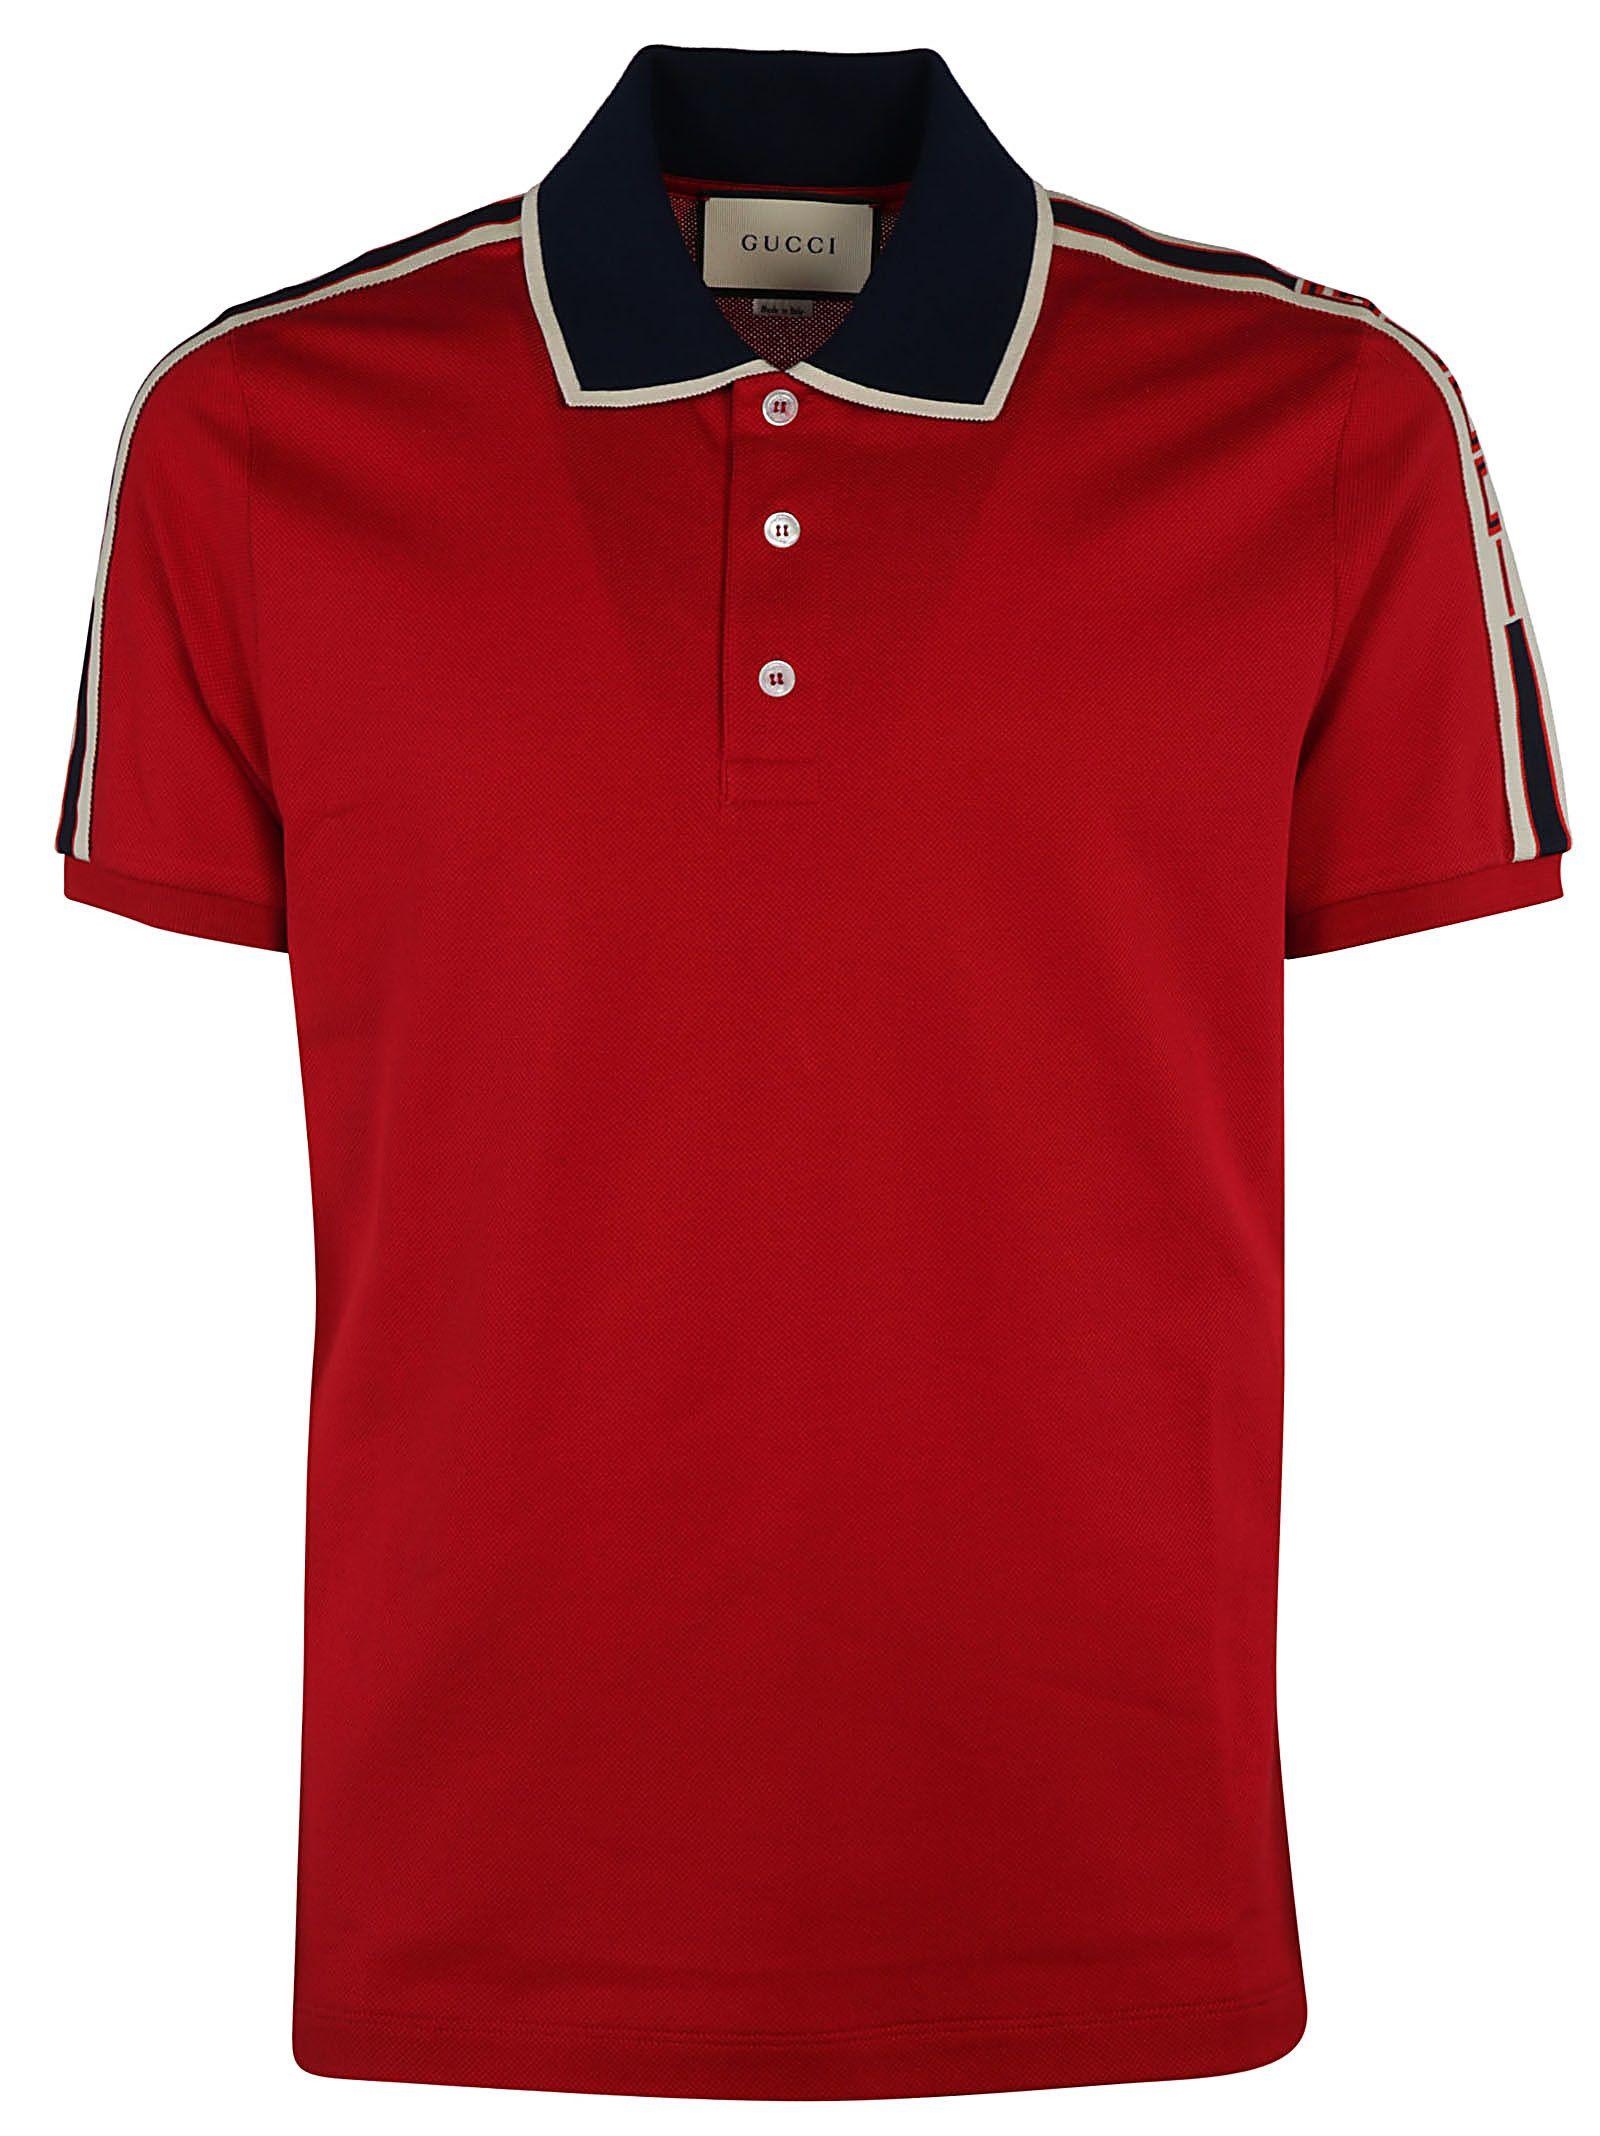 Gucci Striped Trim Polo Shirt